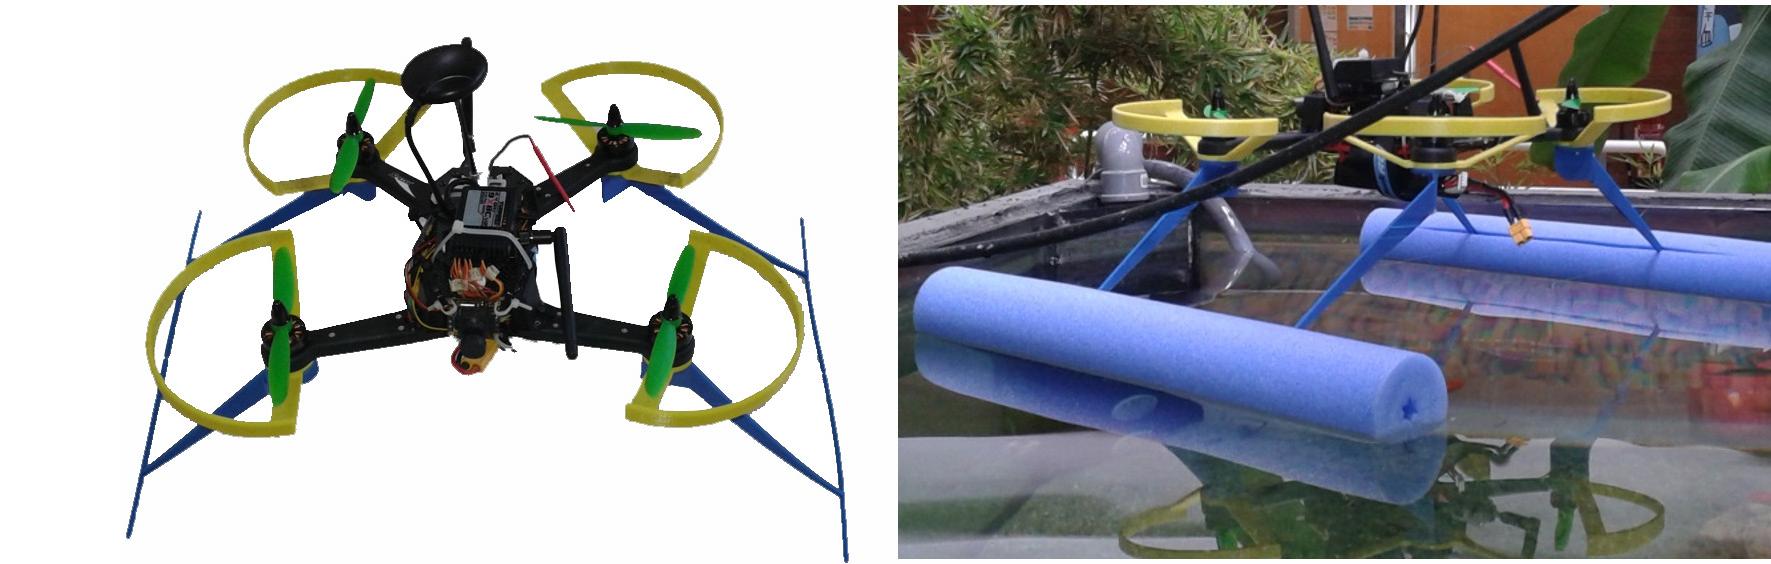 Drone Team - Floating Design